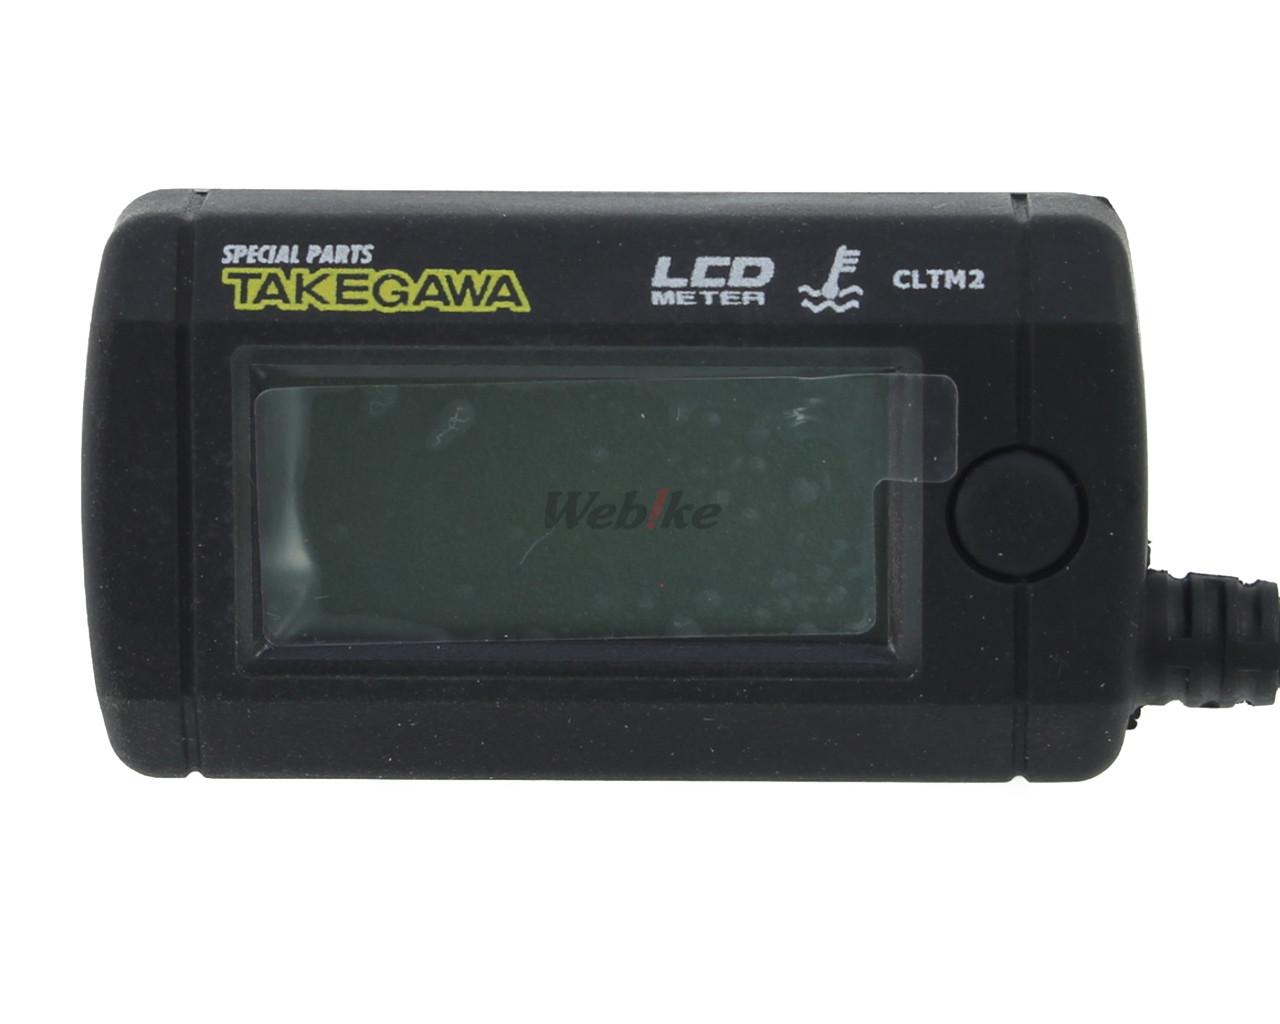 【SP武川】LCD 綜合溫度錶組(電池驅動/外部電源背光型式附MONKEY ,APE用洩油螺絲轉接頭) - 「Webike-摩托百貨」